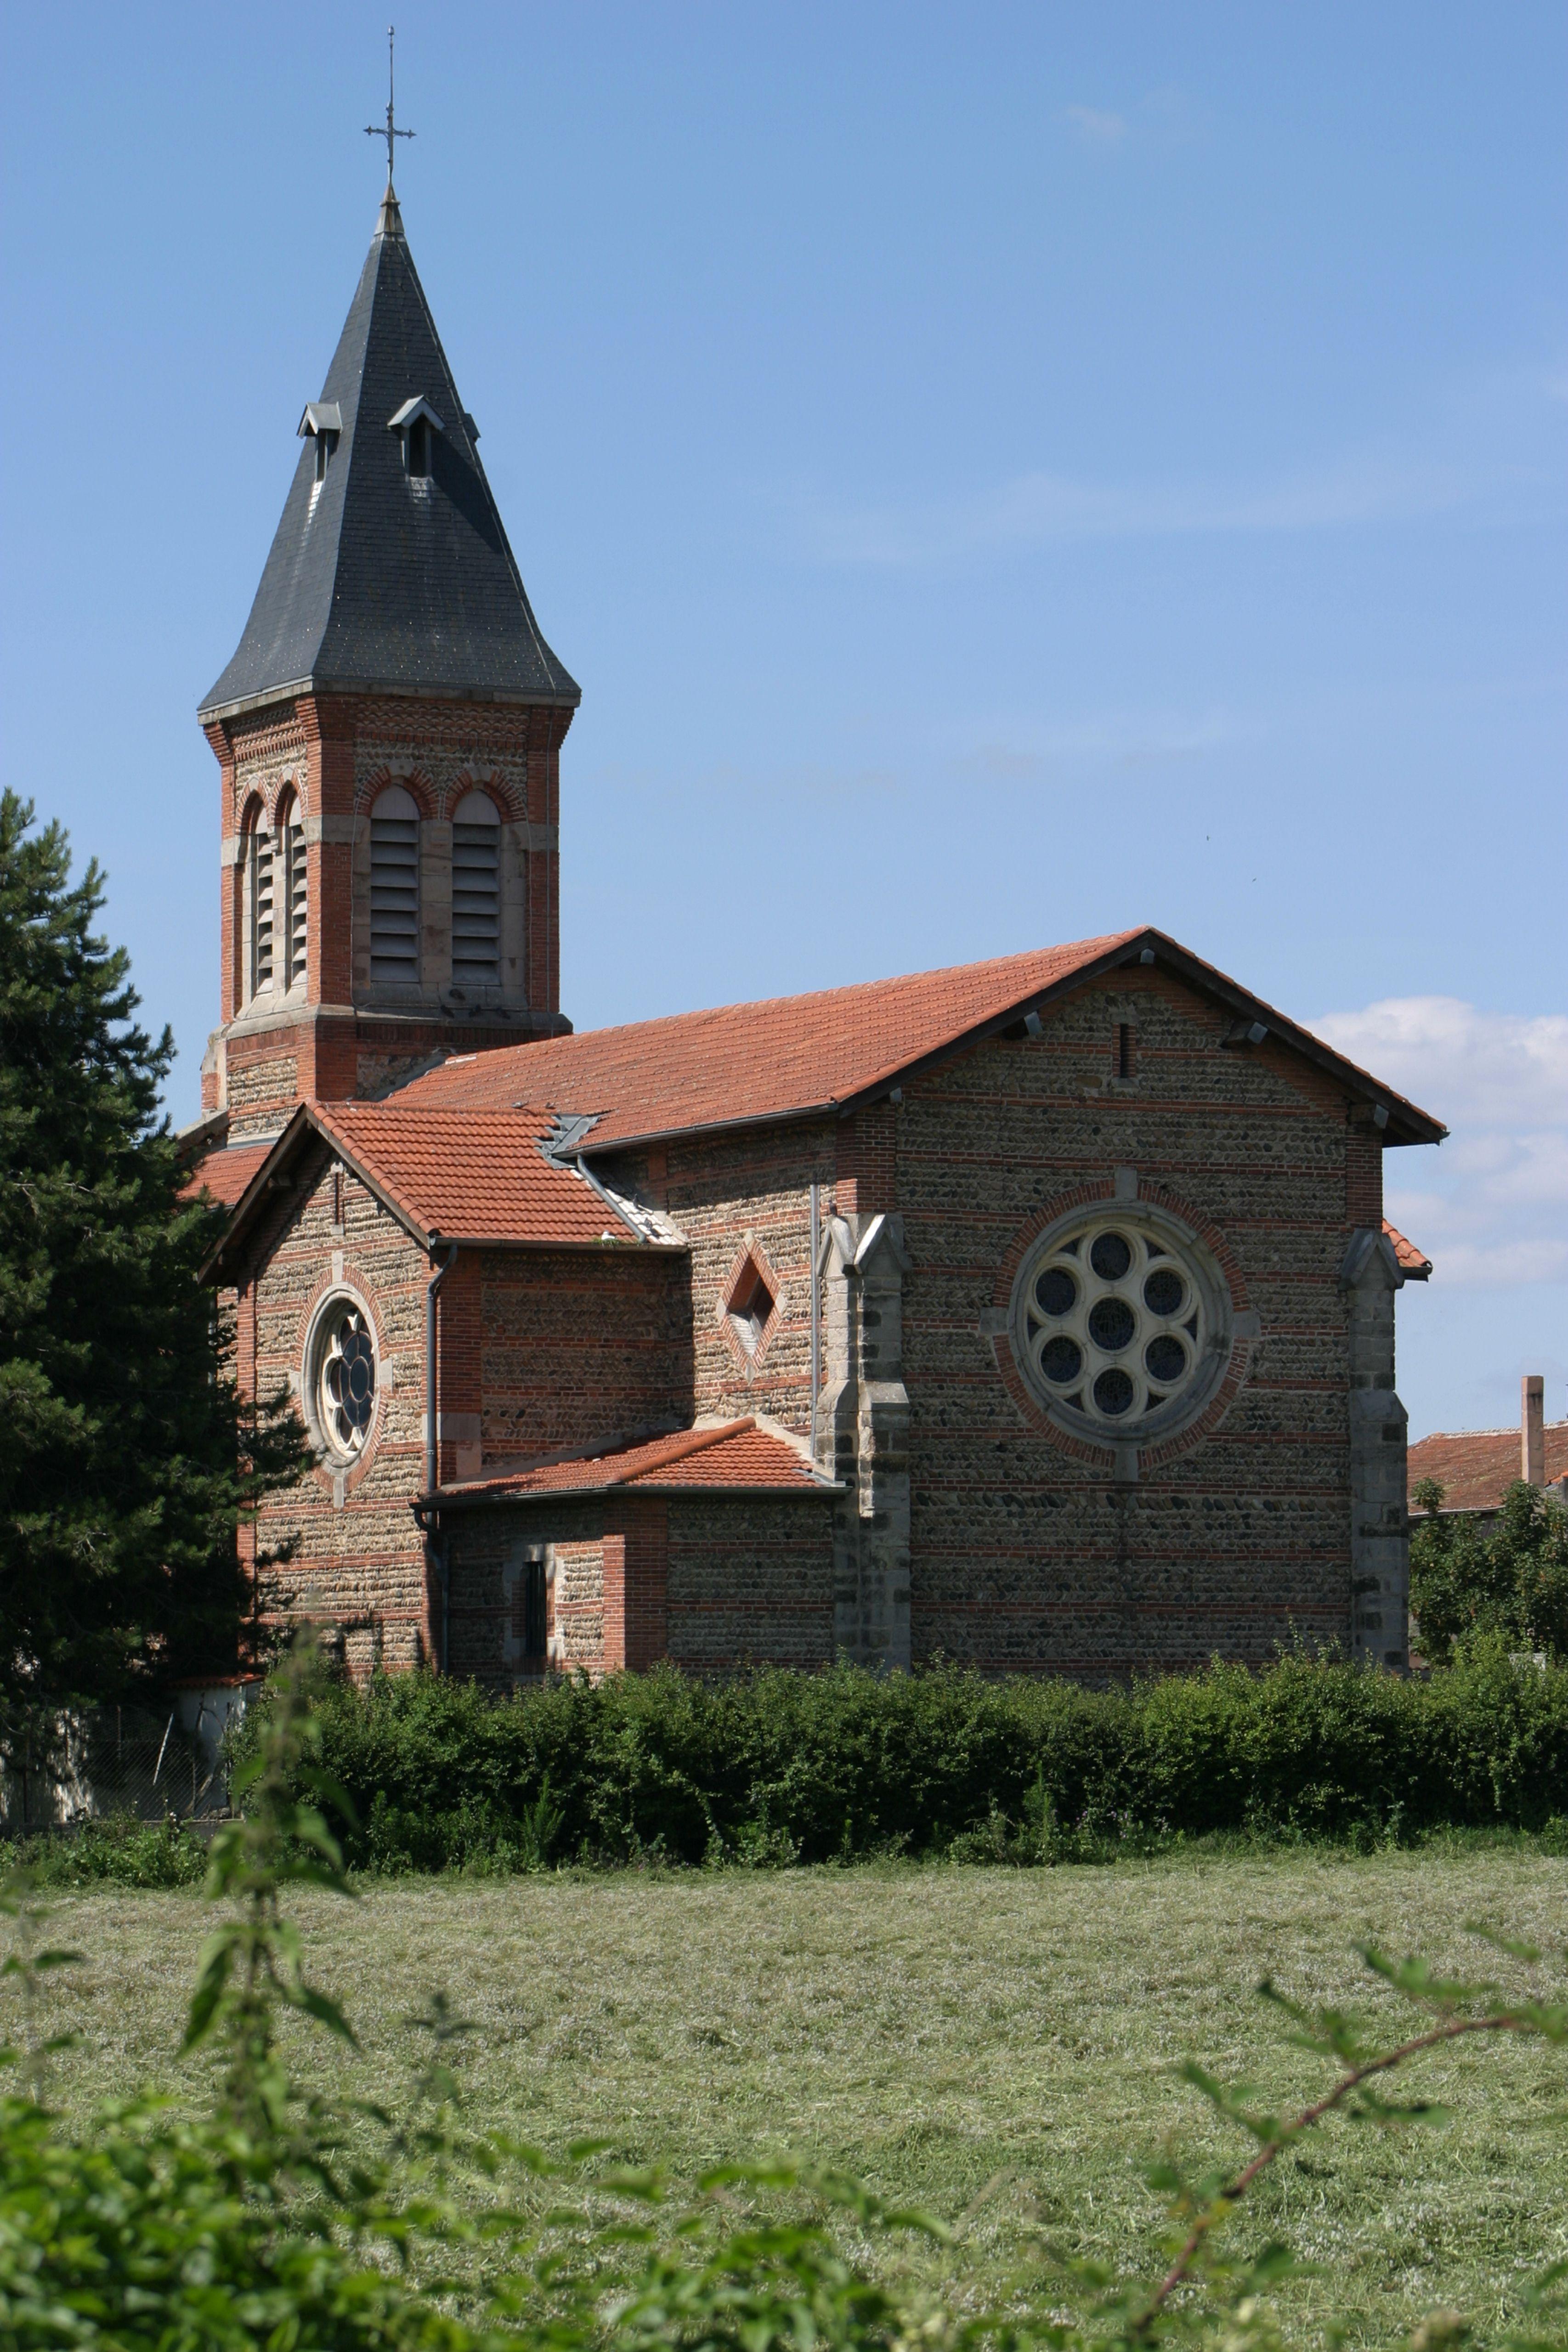 Rivas : Eglise de Rivas